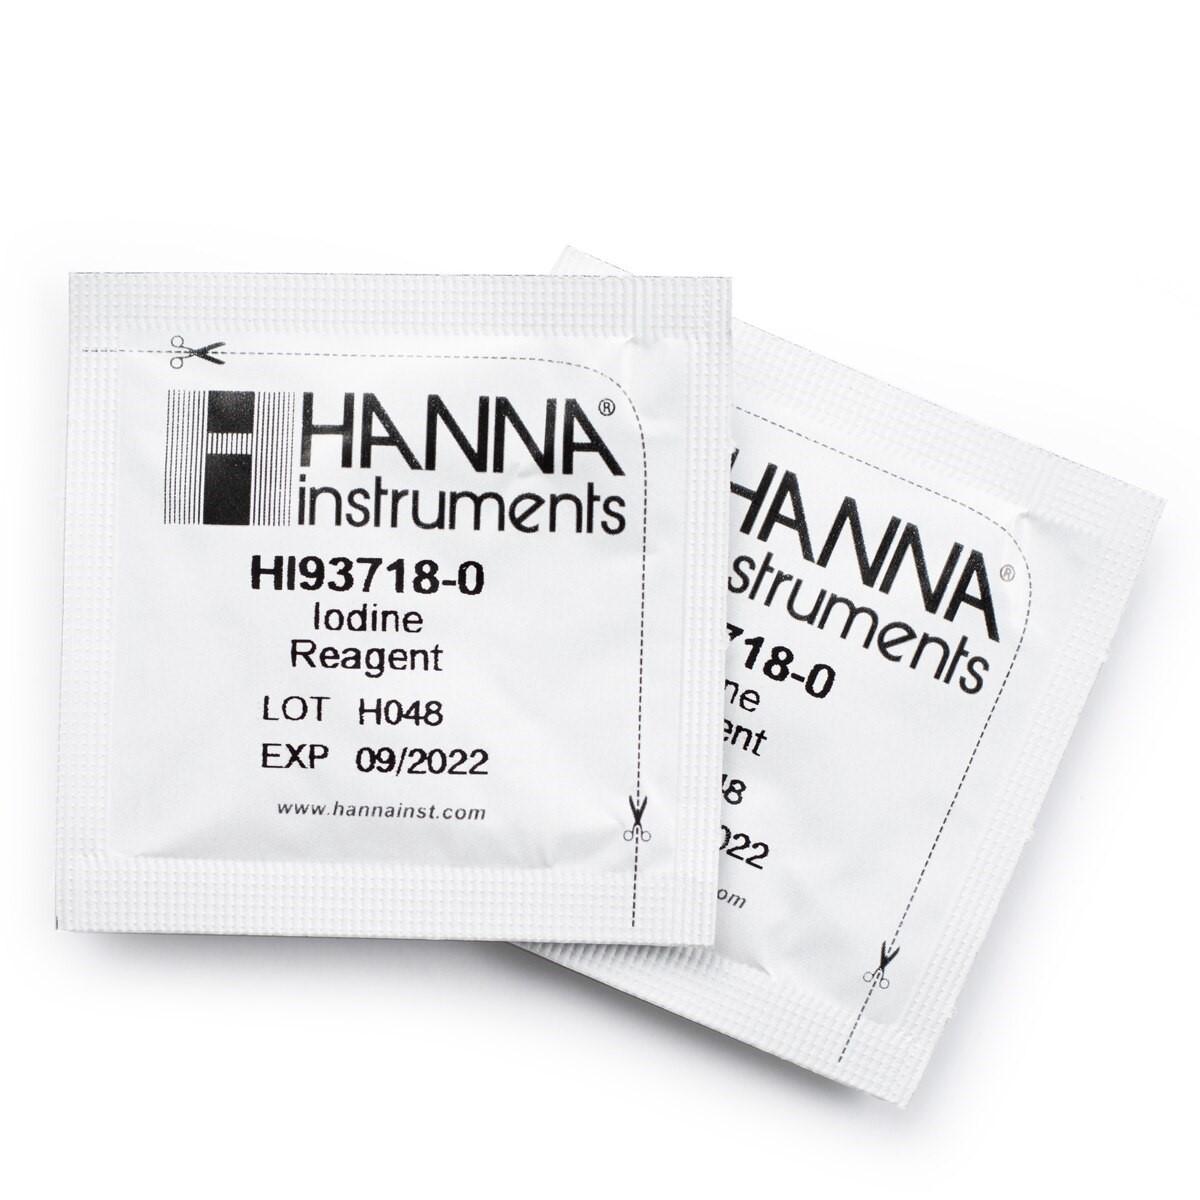 HI93718-03 Iodine Reagents (300 tests)